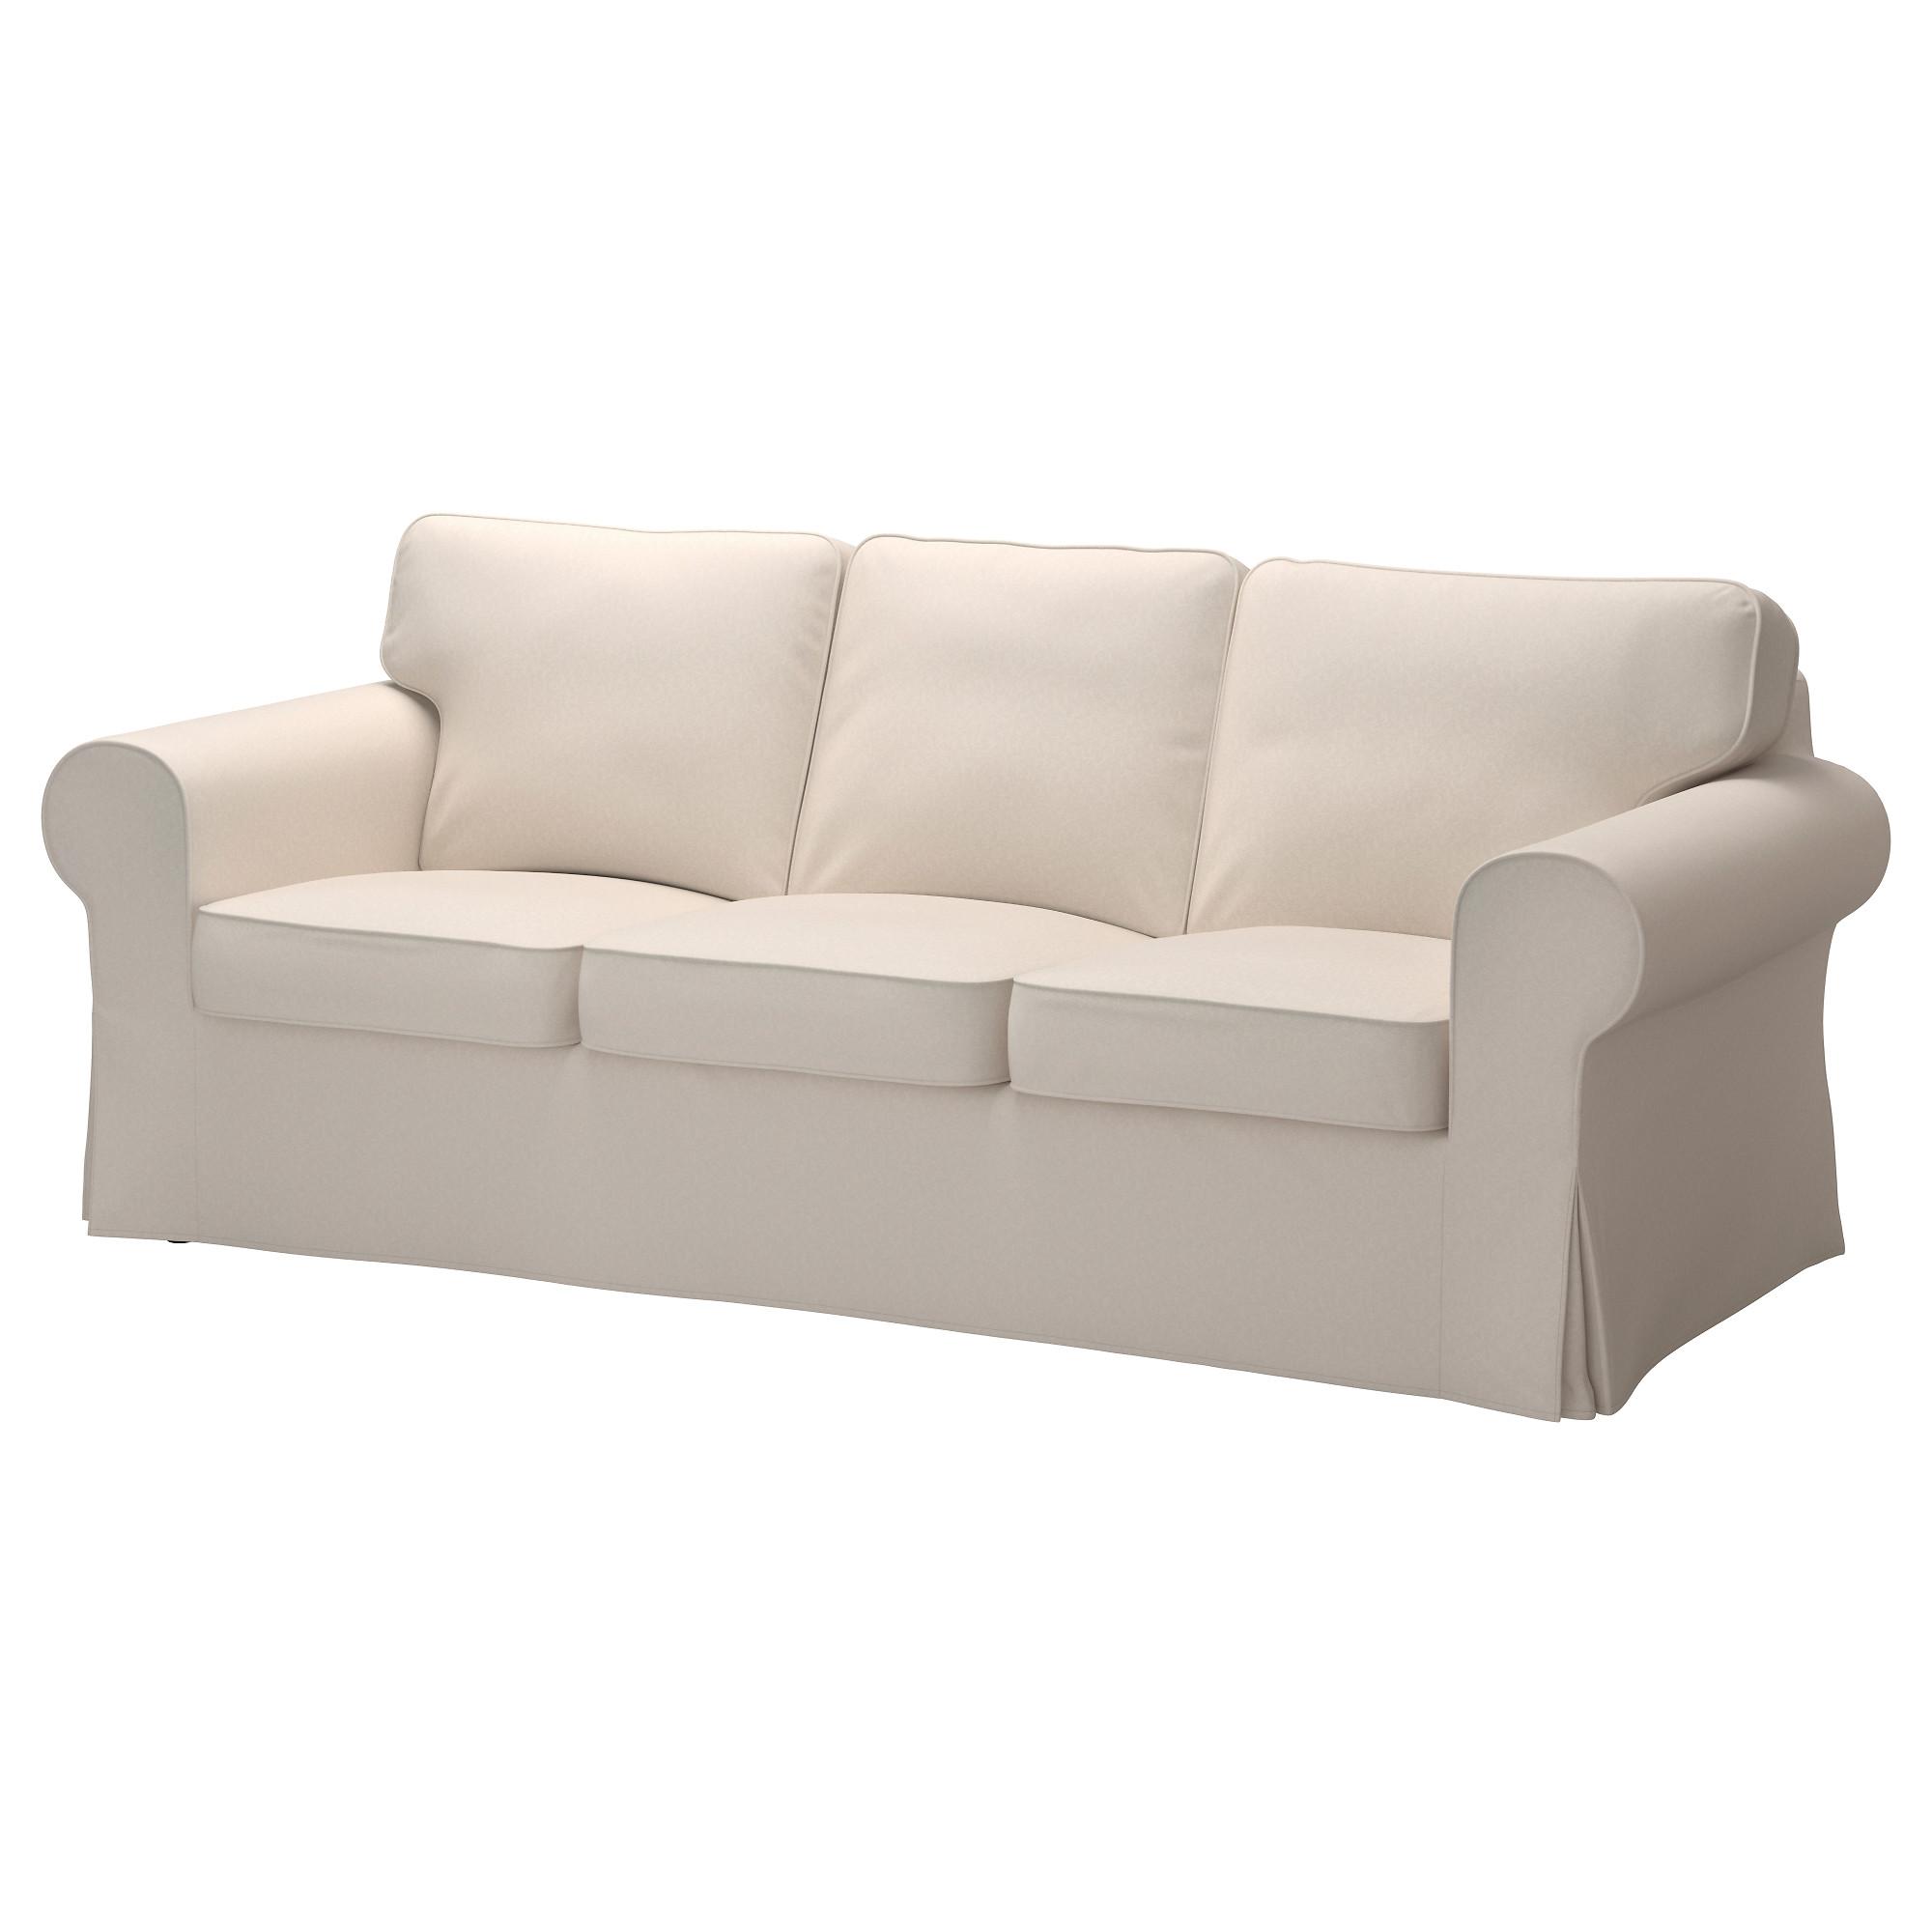 ektorp sofa cover - lofallet beige - ikea WVFYNLA